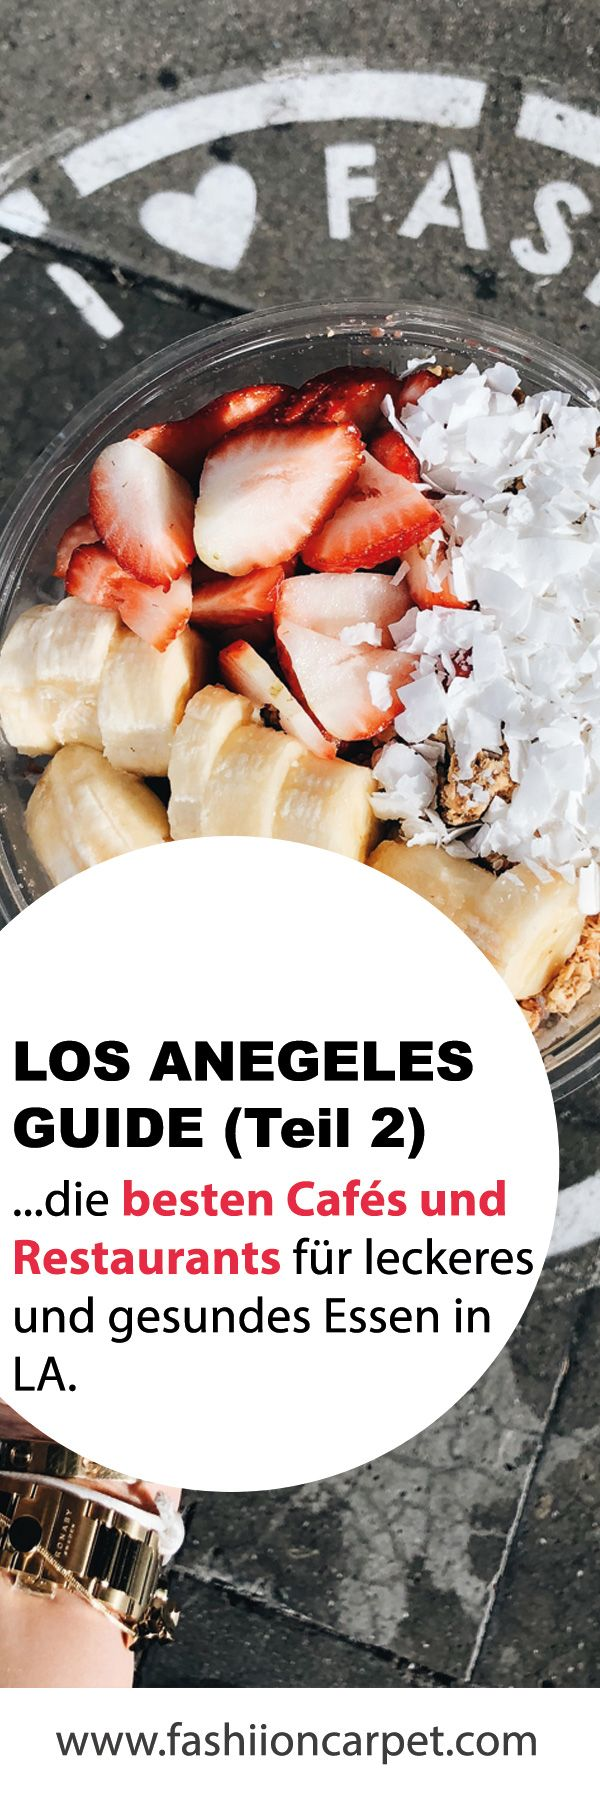 Los Angeles Guide: Cafés & Restaurants